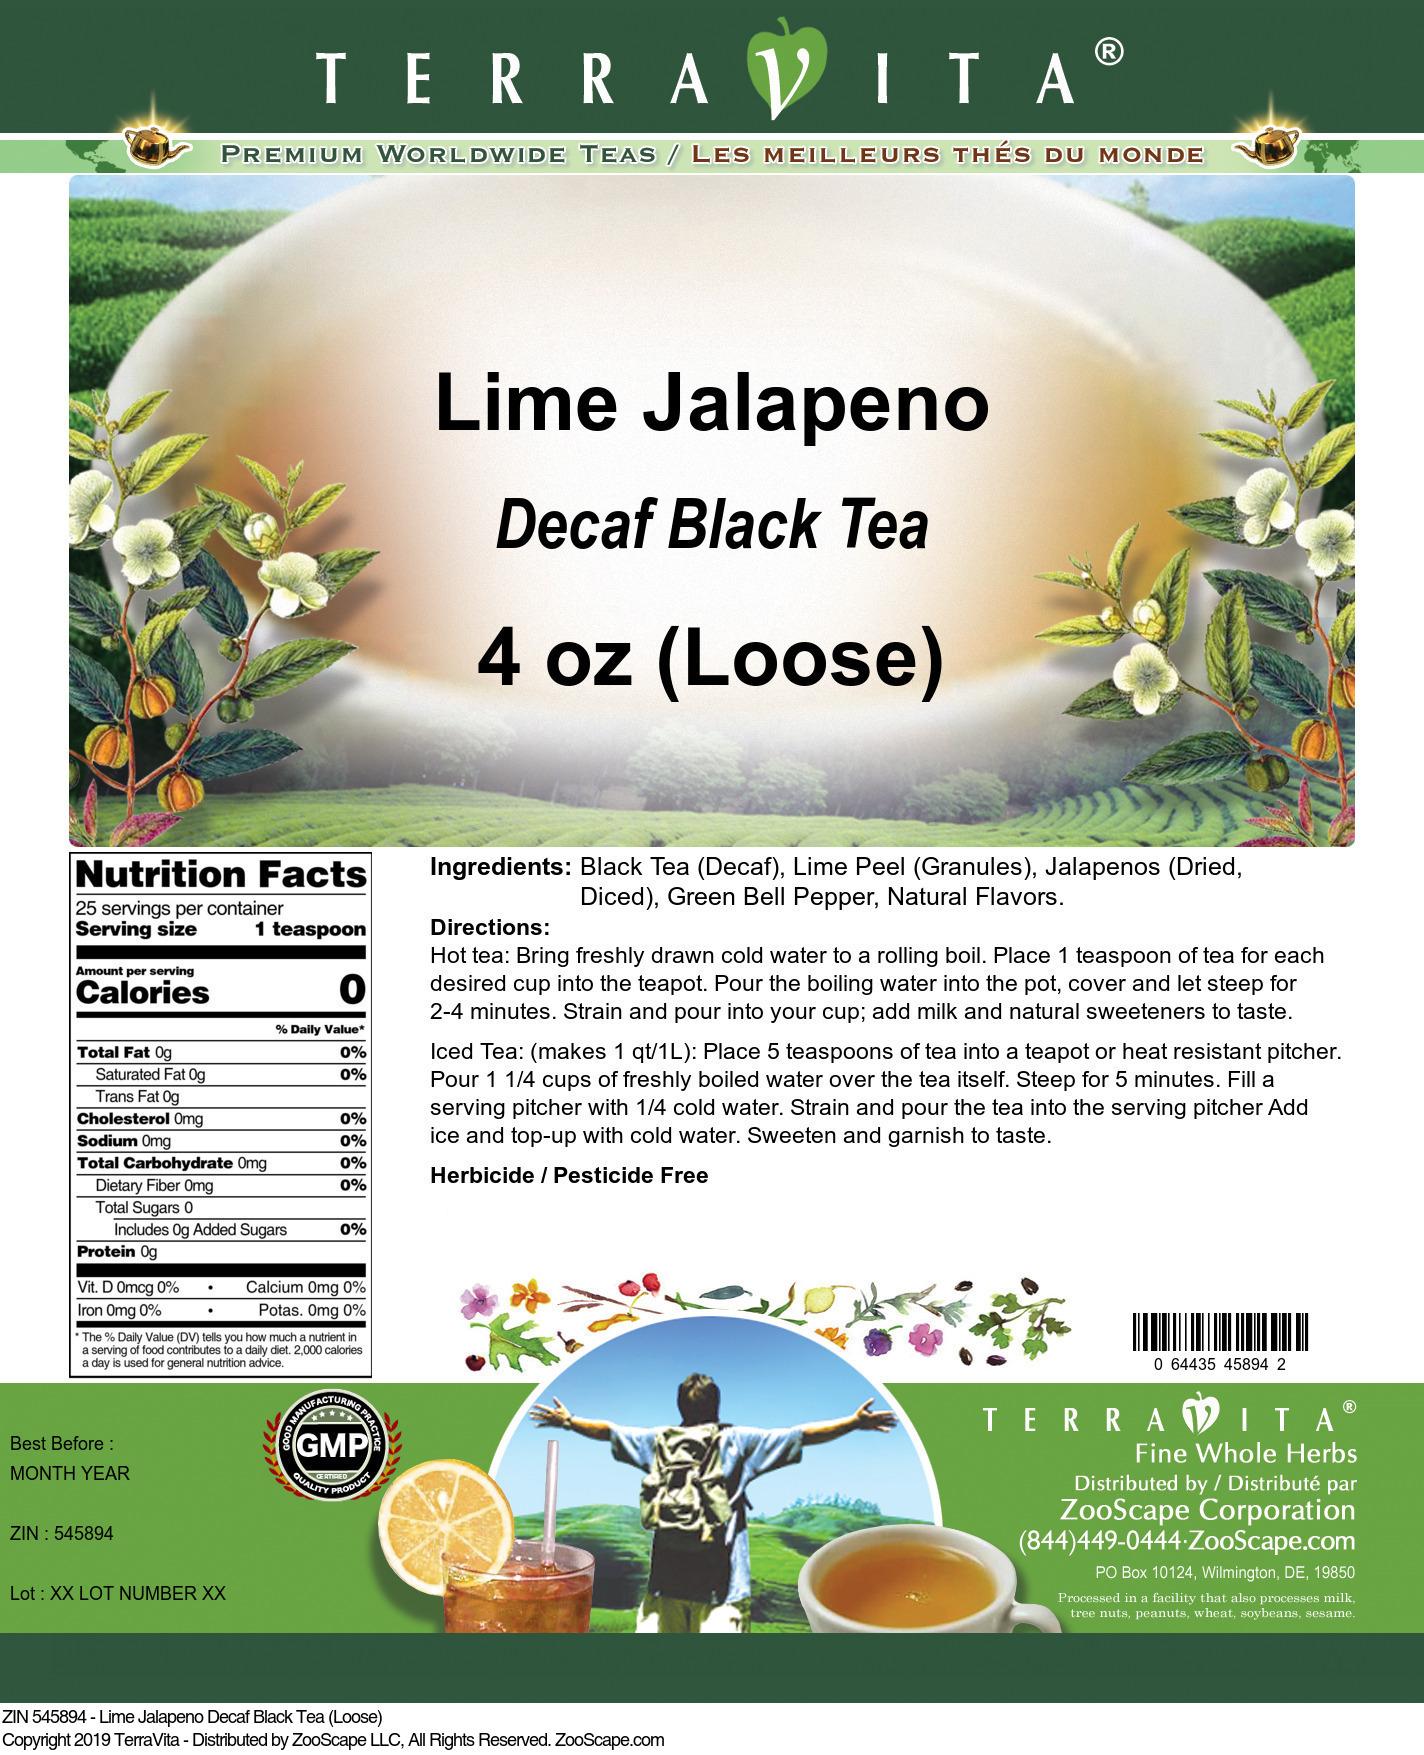 Lime Jalapeno Decaf Black Tea (Loose)